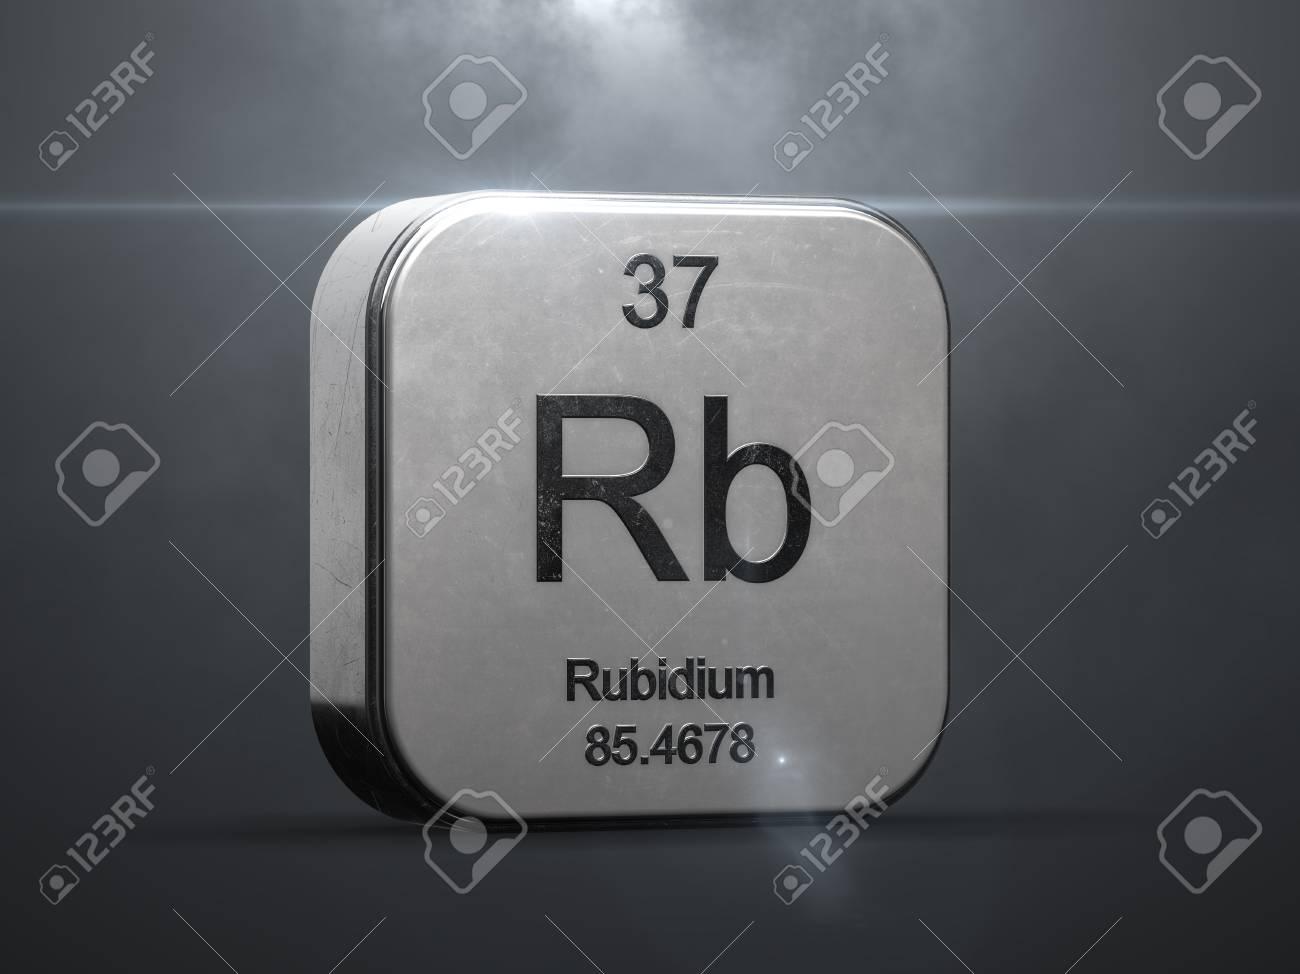 rubidium element from the periodic table metallic icon 3d rendered